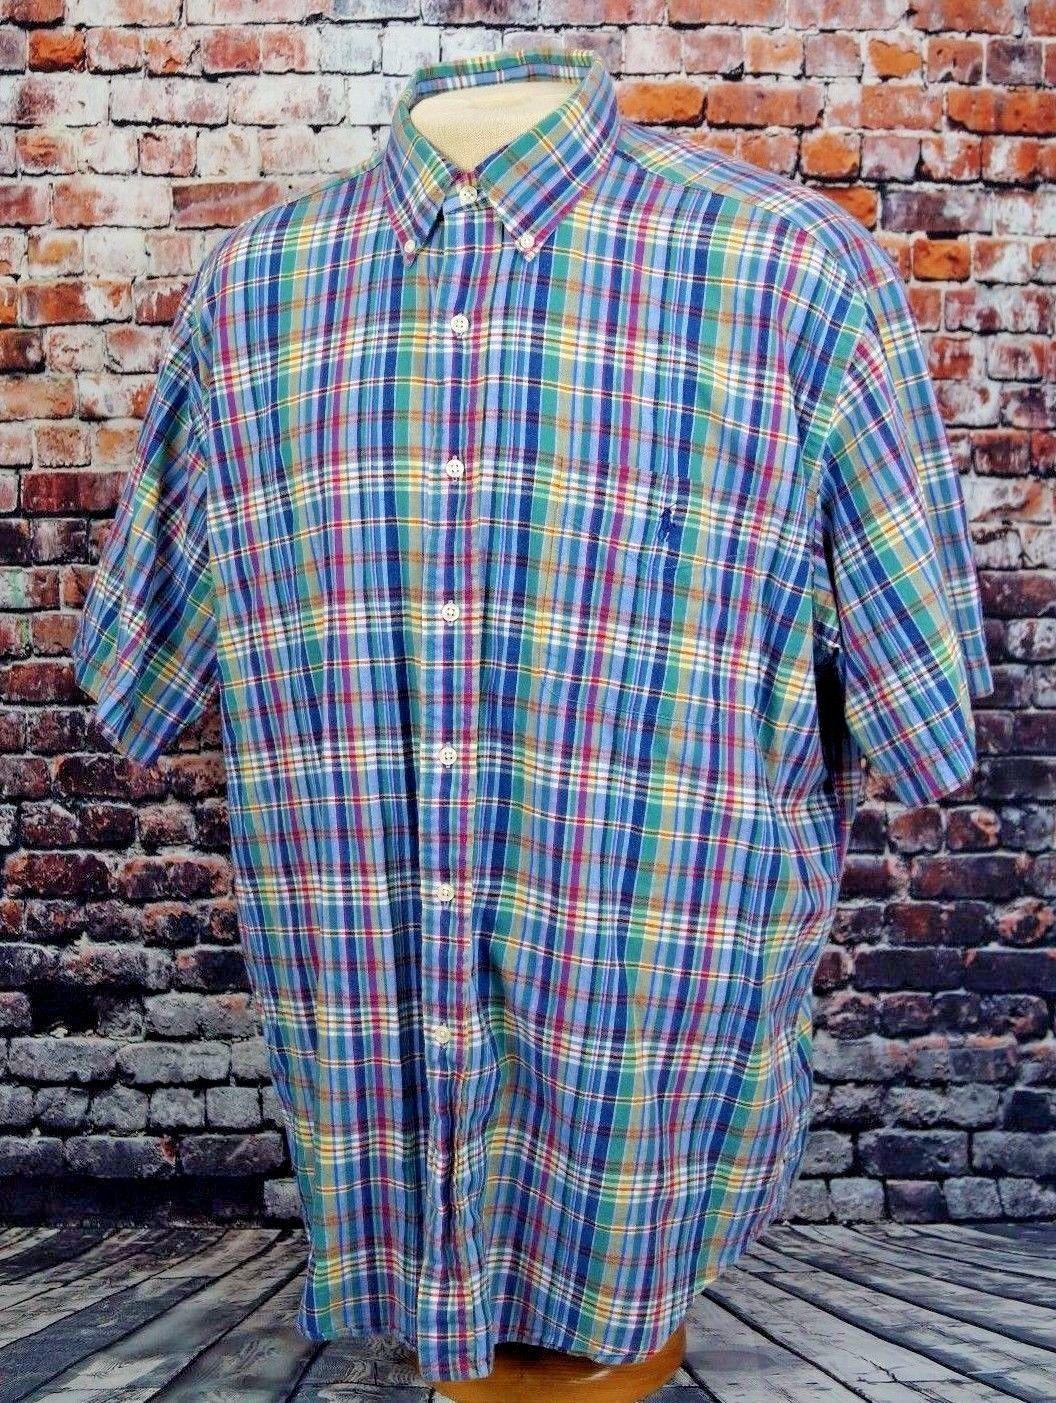 Polo Ralph Lauren Men's Blake Casual Shirt Madras Plaid Short Sleeve Sz. XL